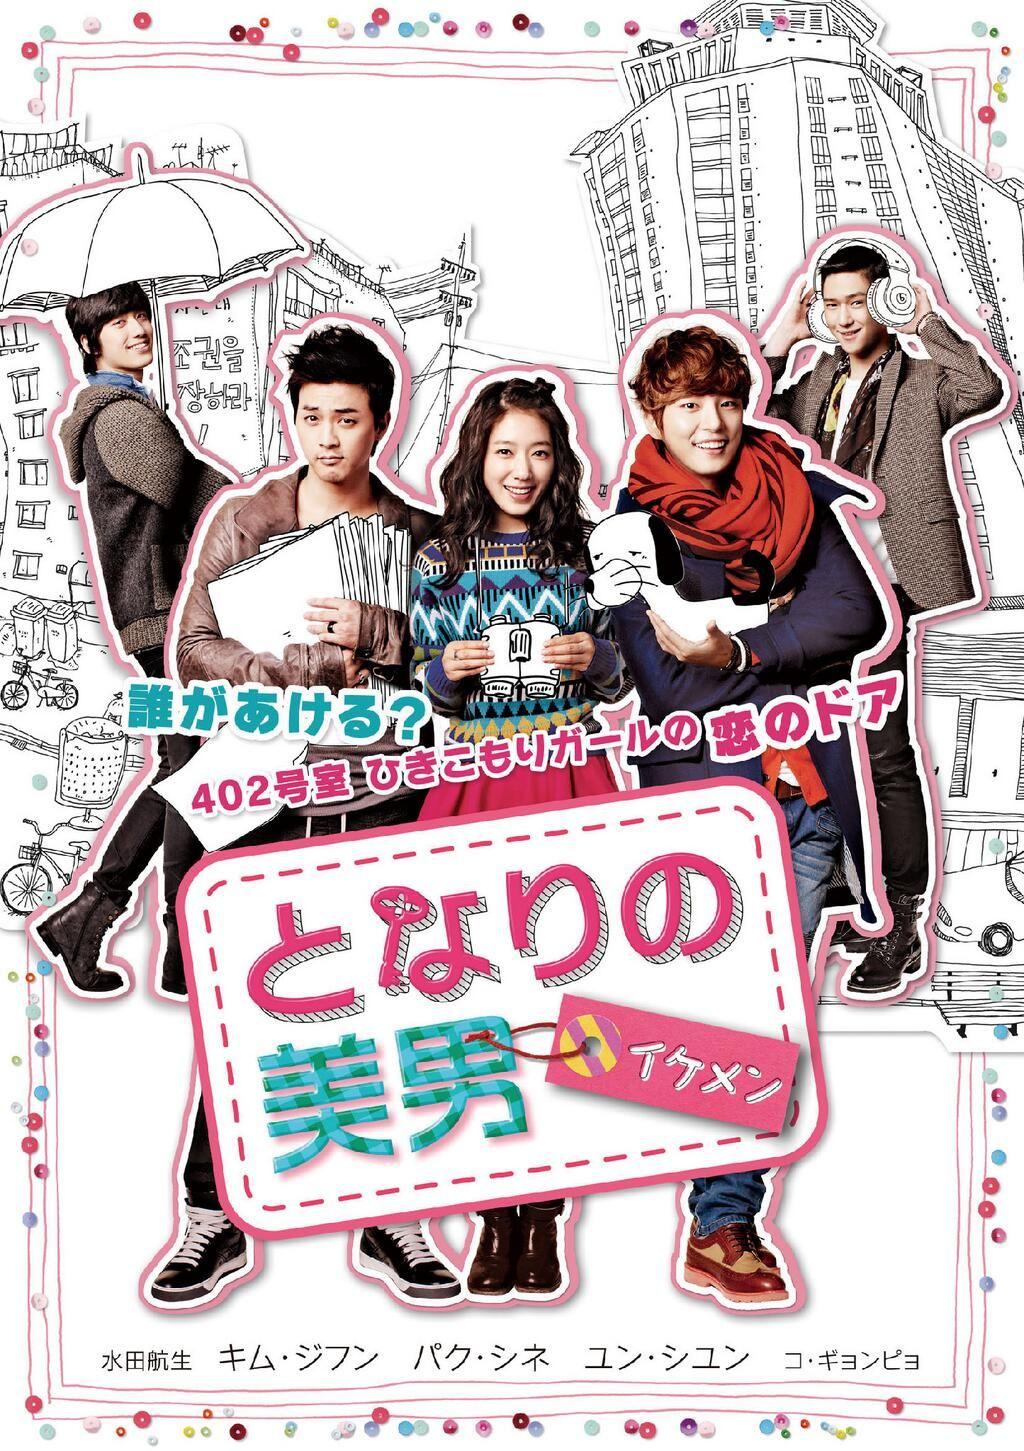 Love韓流カルチュアパブリッシャーズ On Twitter Drama Kdrama Tv